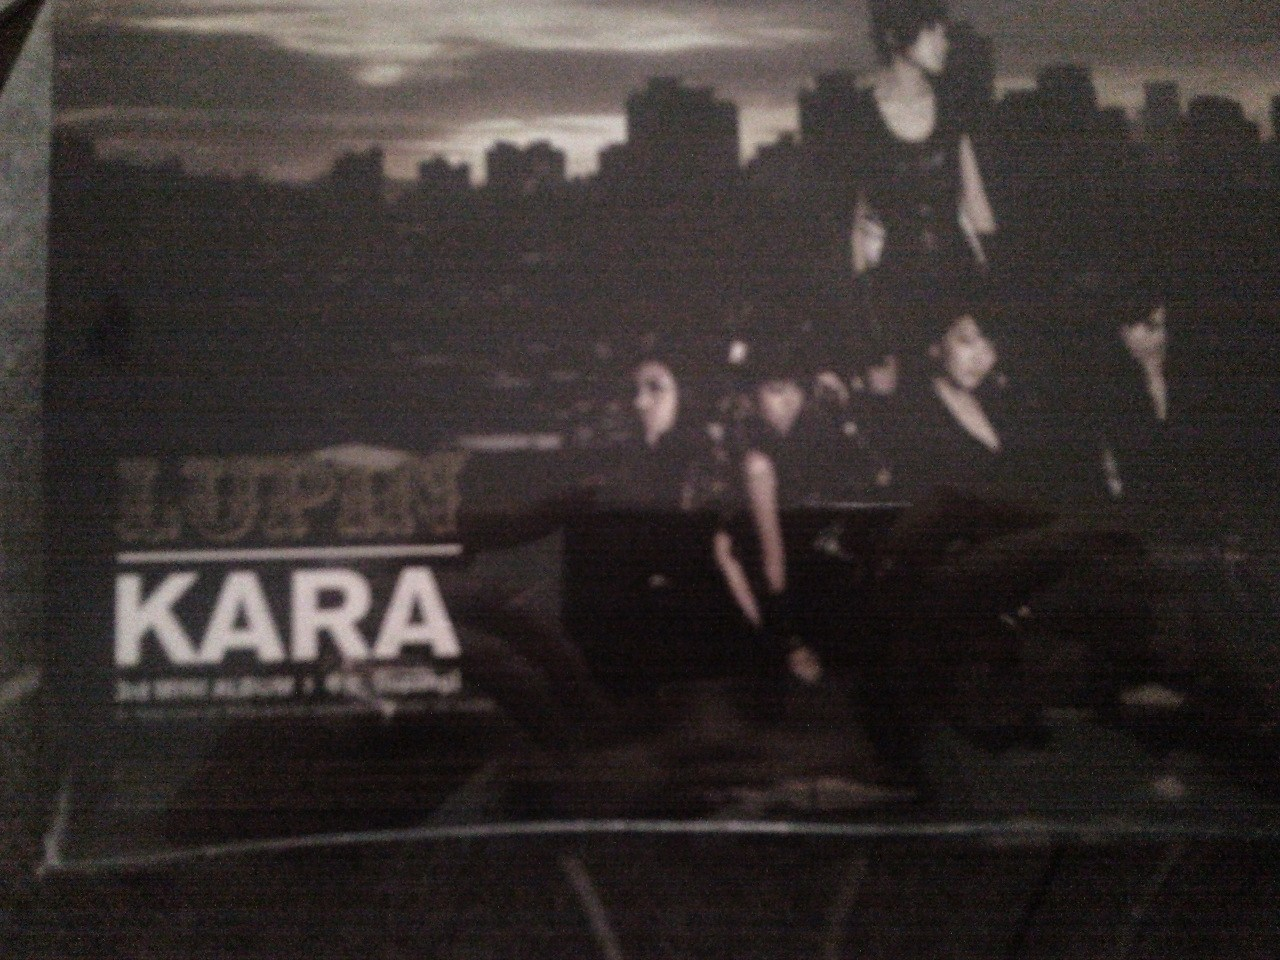 [KARA_CD_New+Album(Lupin).jpg]